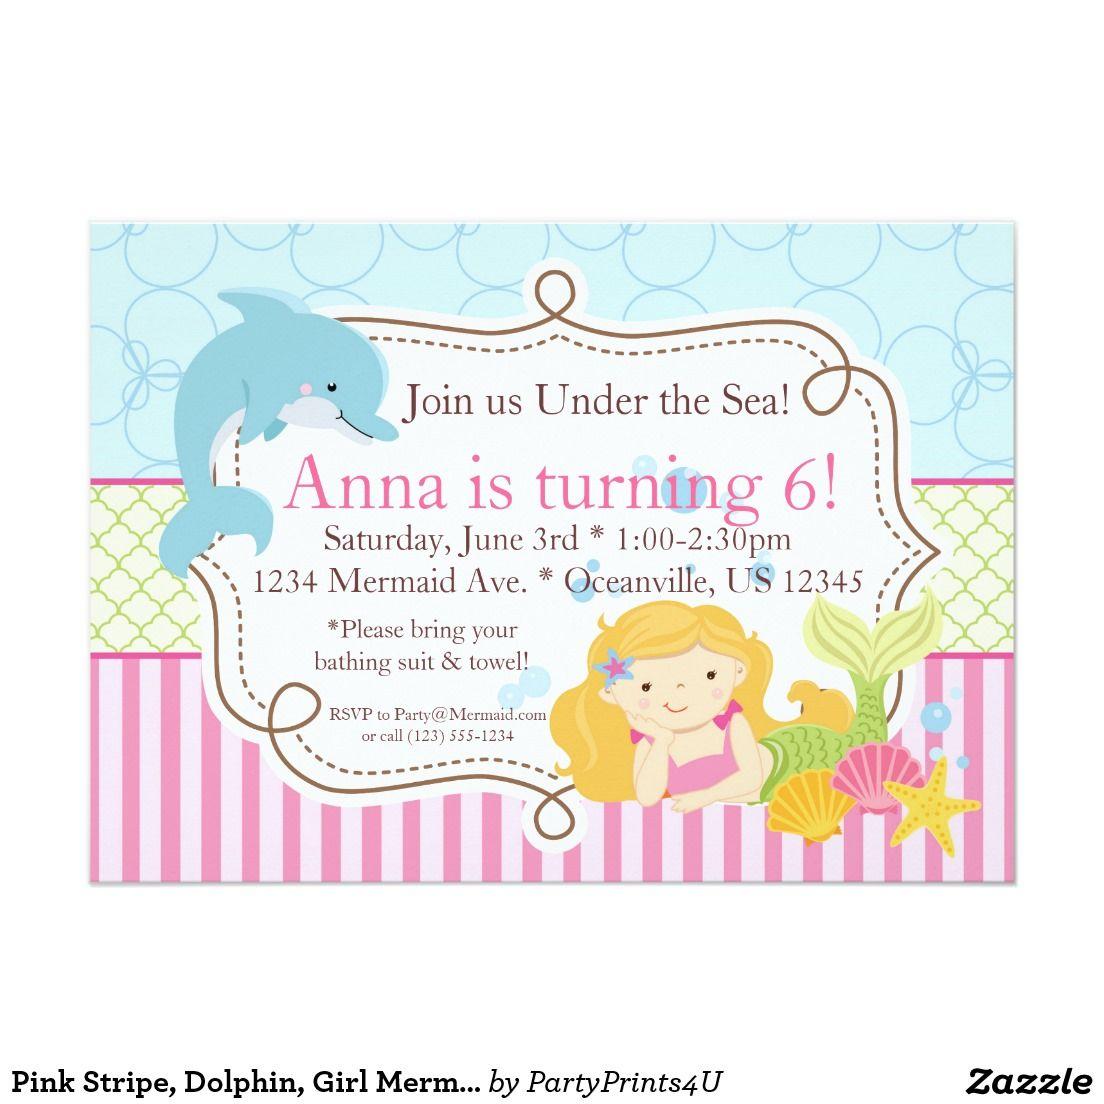 Pink Stripe, Dolphin, Girl Mermaid Birthday Party Invitation ...